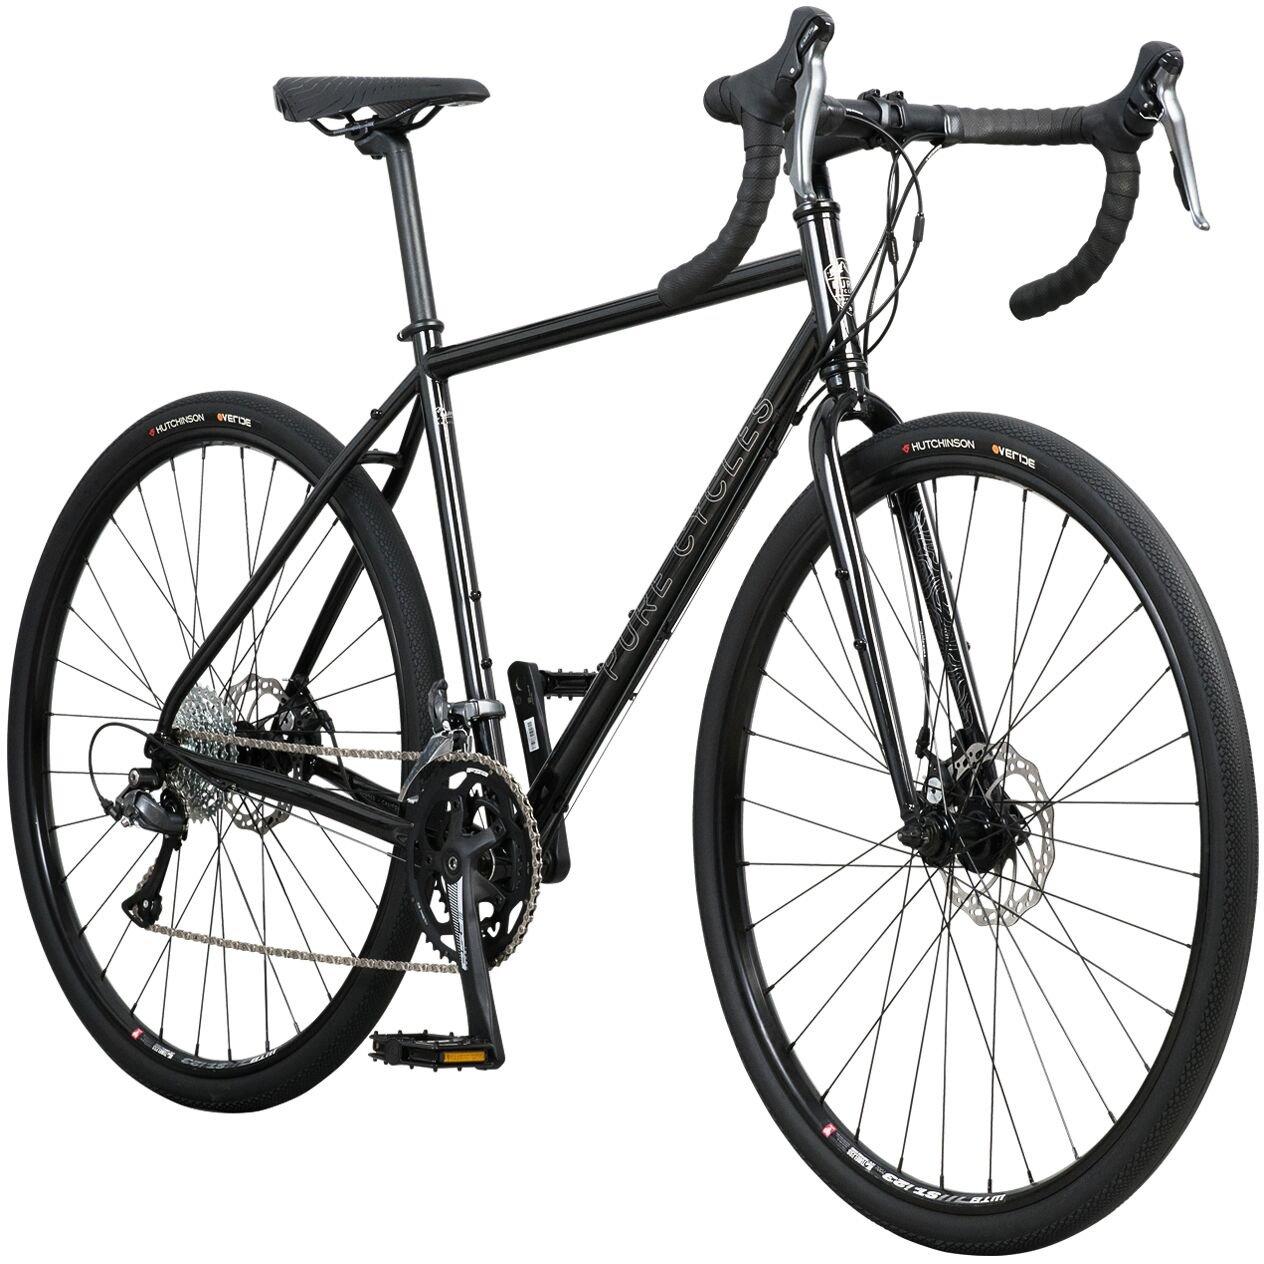 Sunrace CSM55 11-32t// 34t 8 Speed Cassette Hybrid Road MTB Fit Shimano Bike